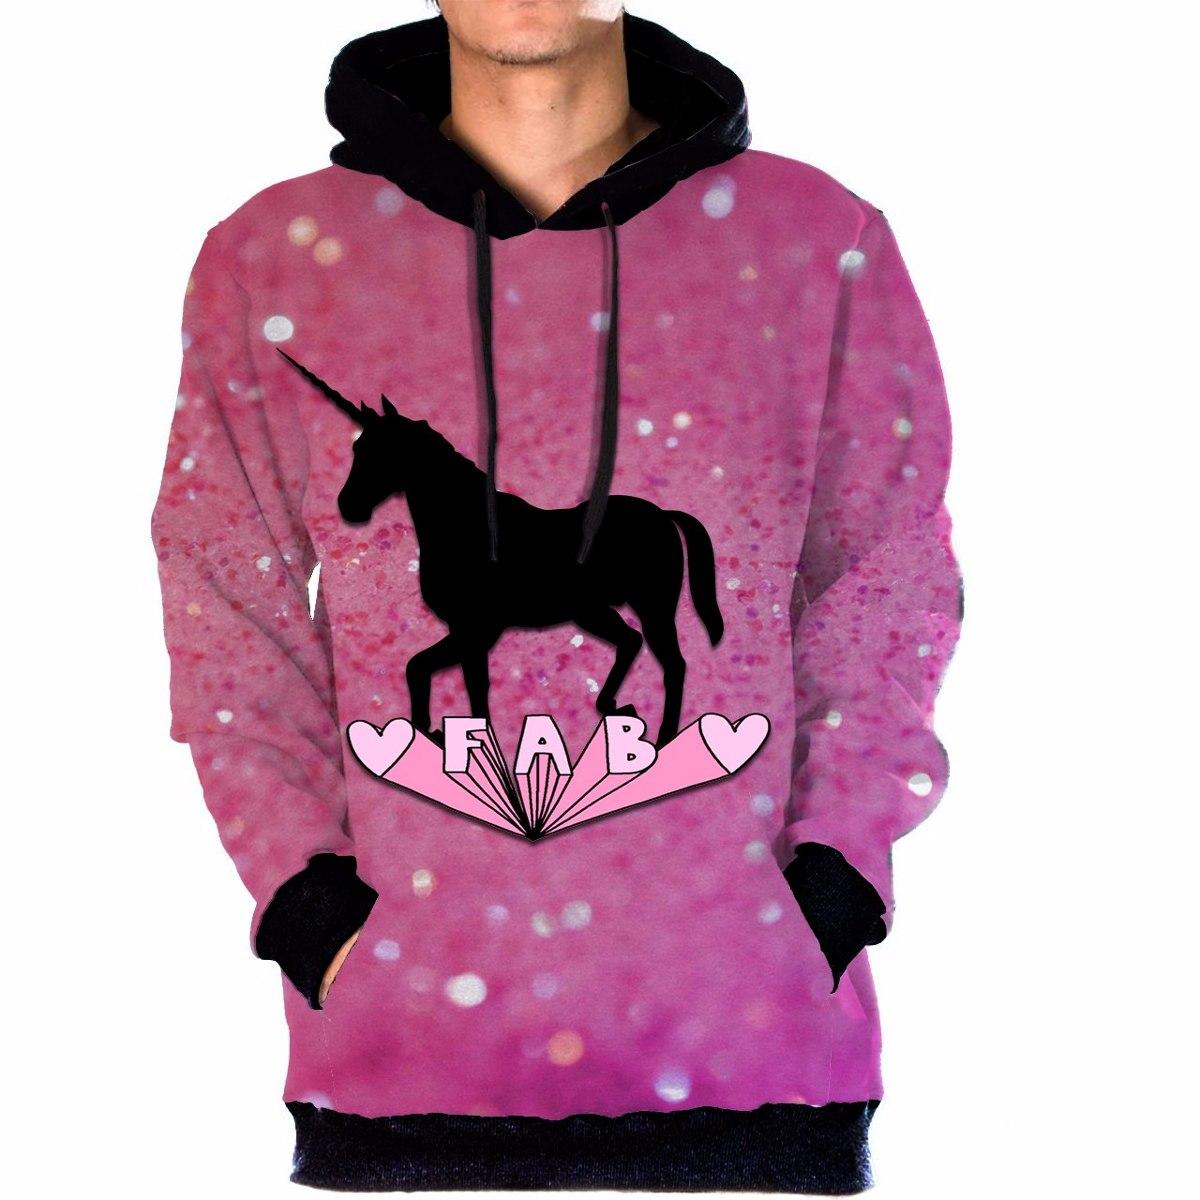 97e5a7b4b blusas femininas moletom tumblr glitter unicornio rosa fofo. Carregando zoom .